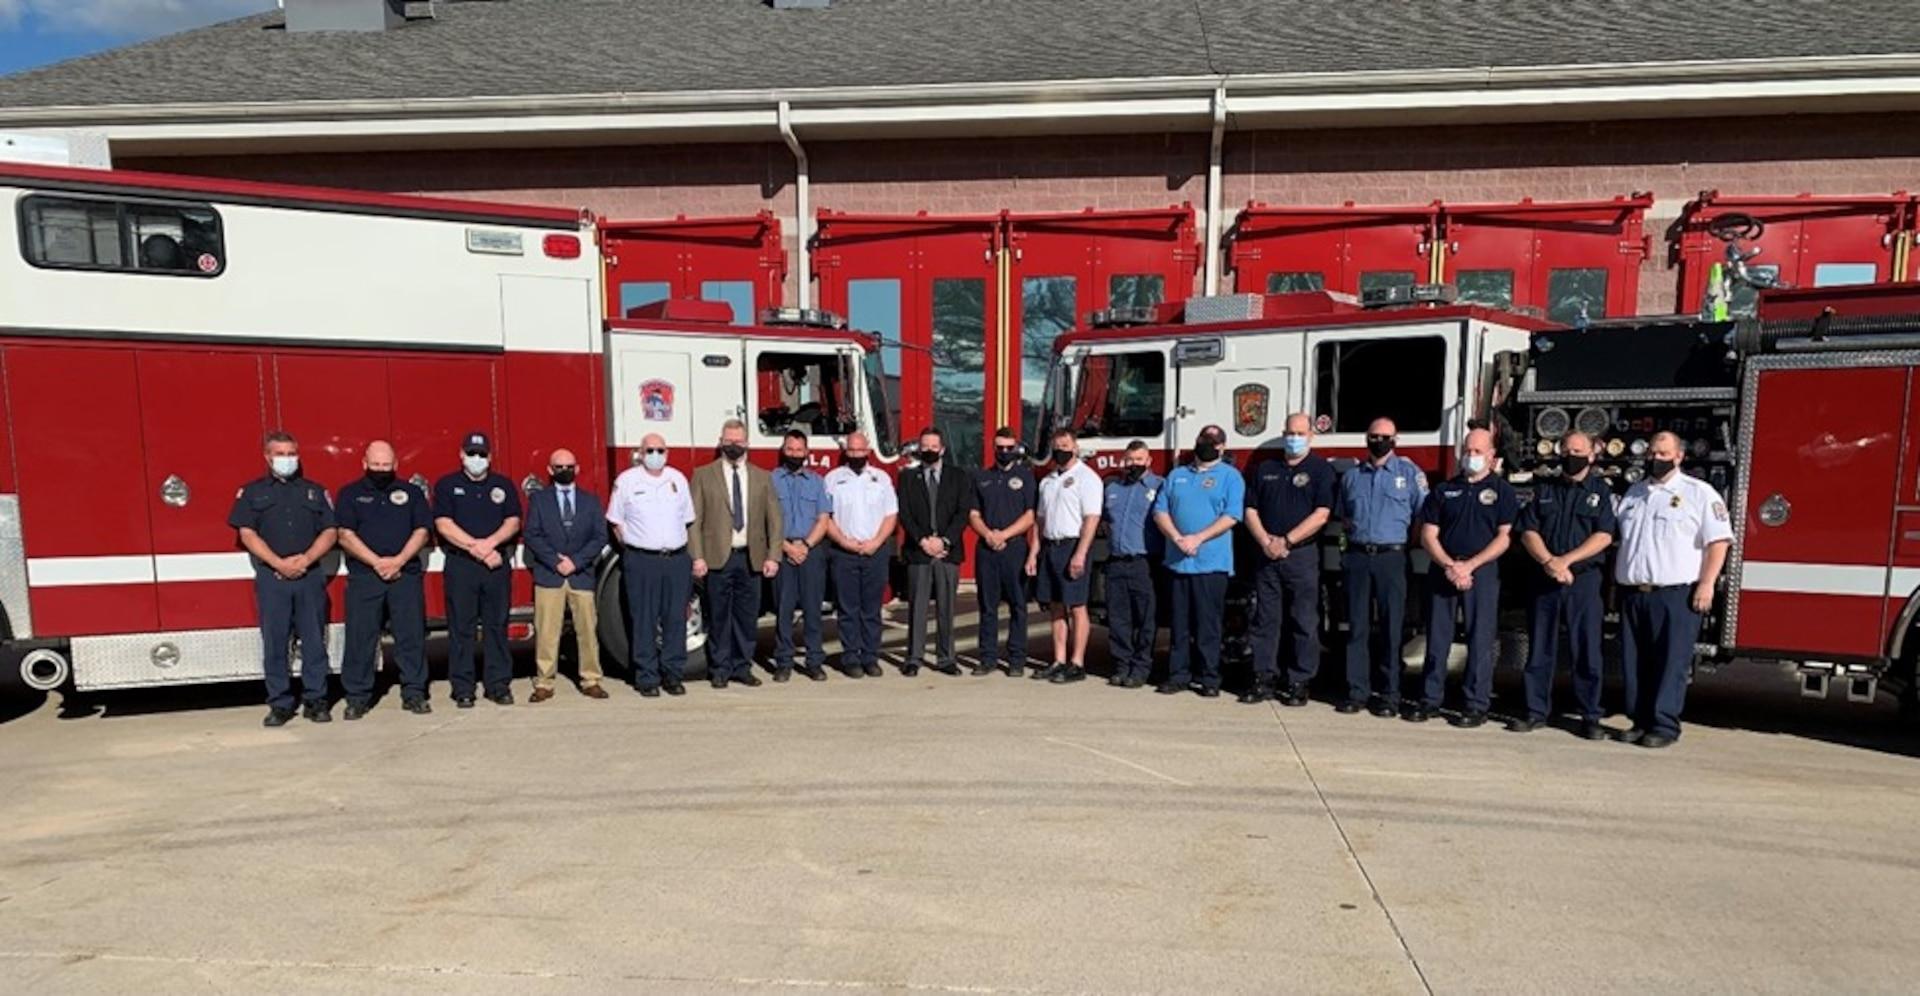 DLA Susquehanna Fire Department awarded international accredited status